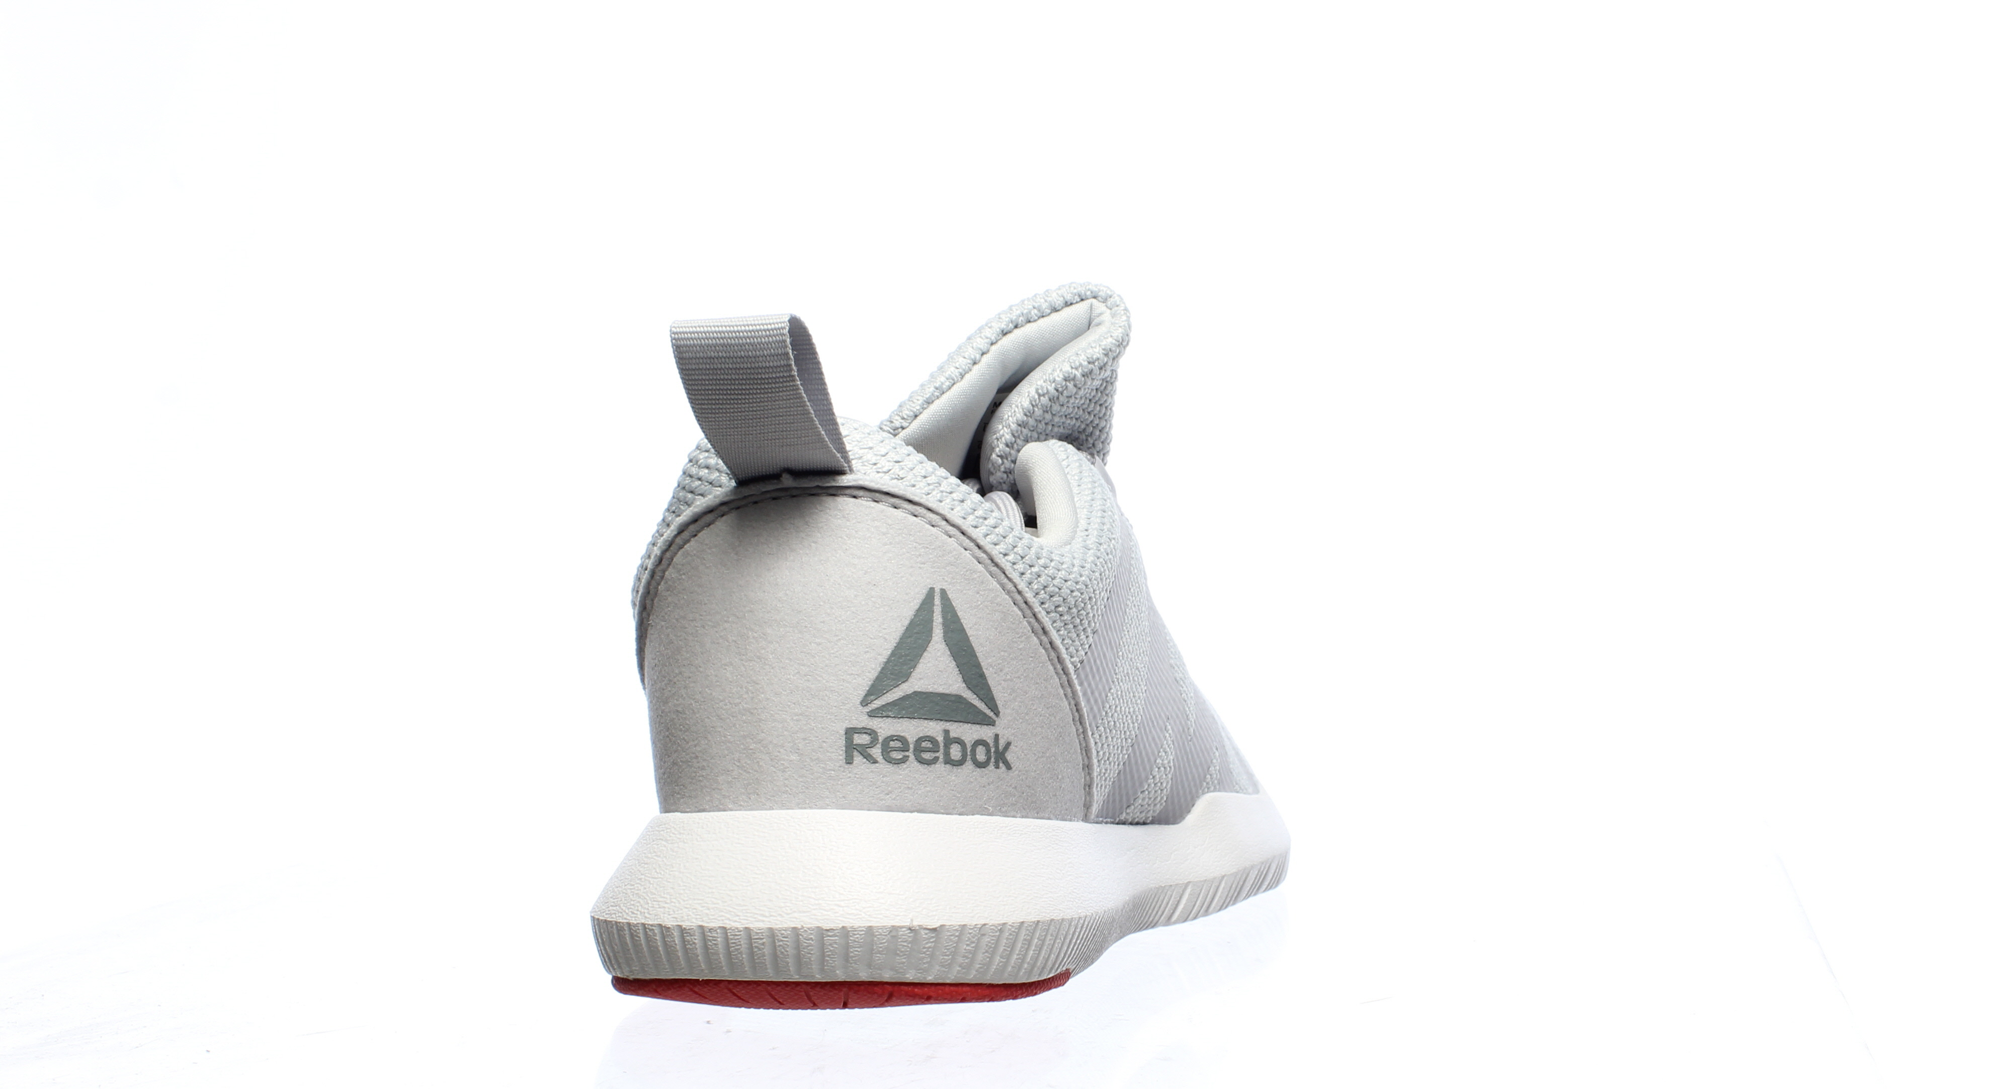 Reebok-Mens-Athletic-Reago-Pulse-Cross-Training-Shoes miniature 15